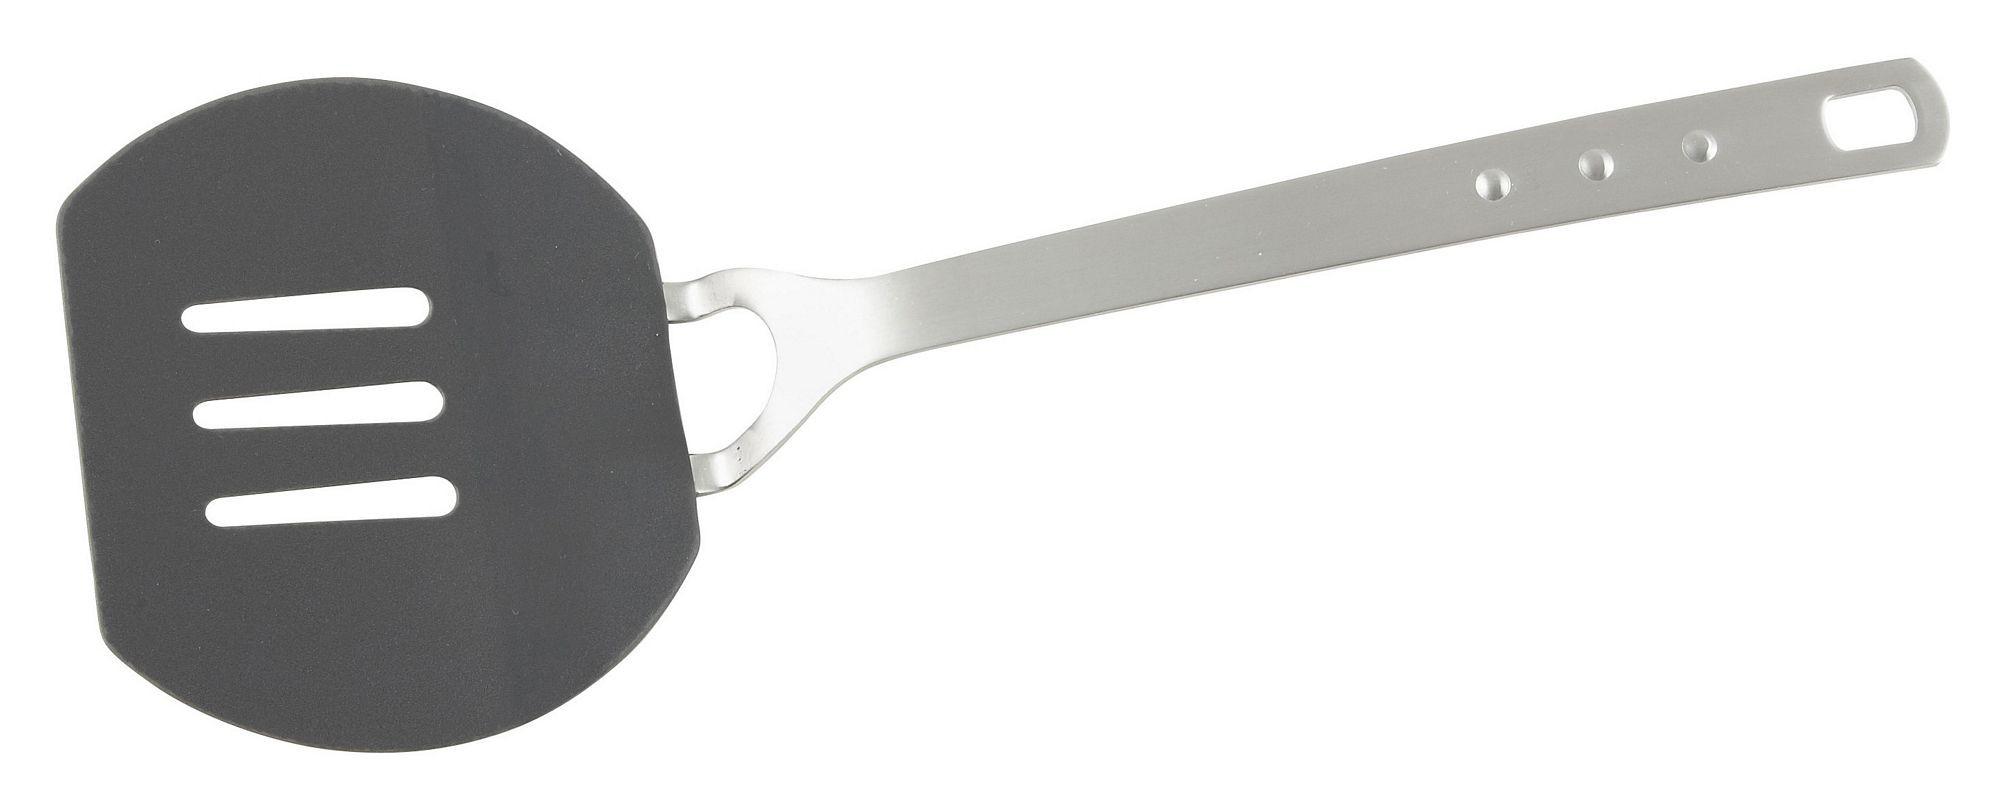 Winco STN-3 Stainless Steel Pancake Turner